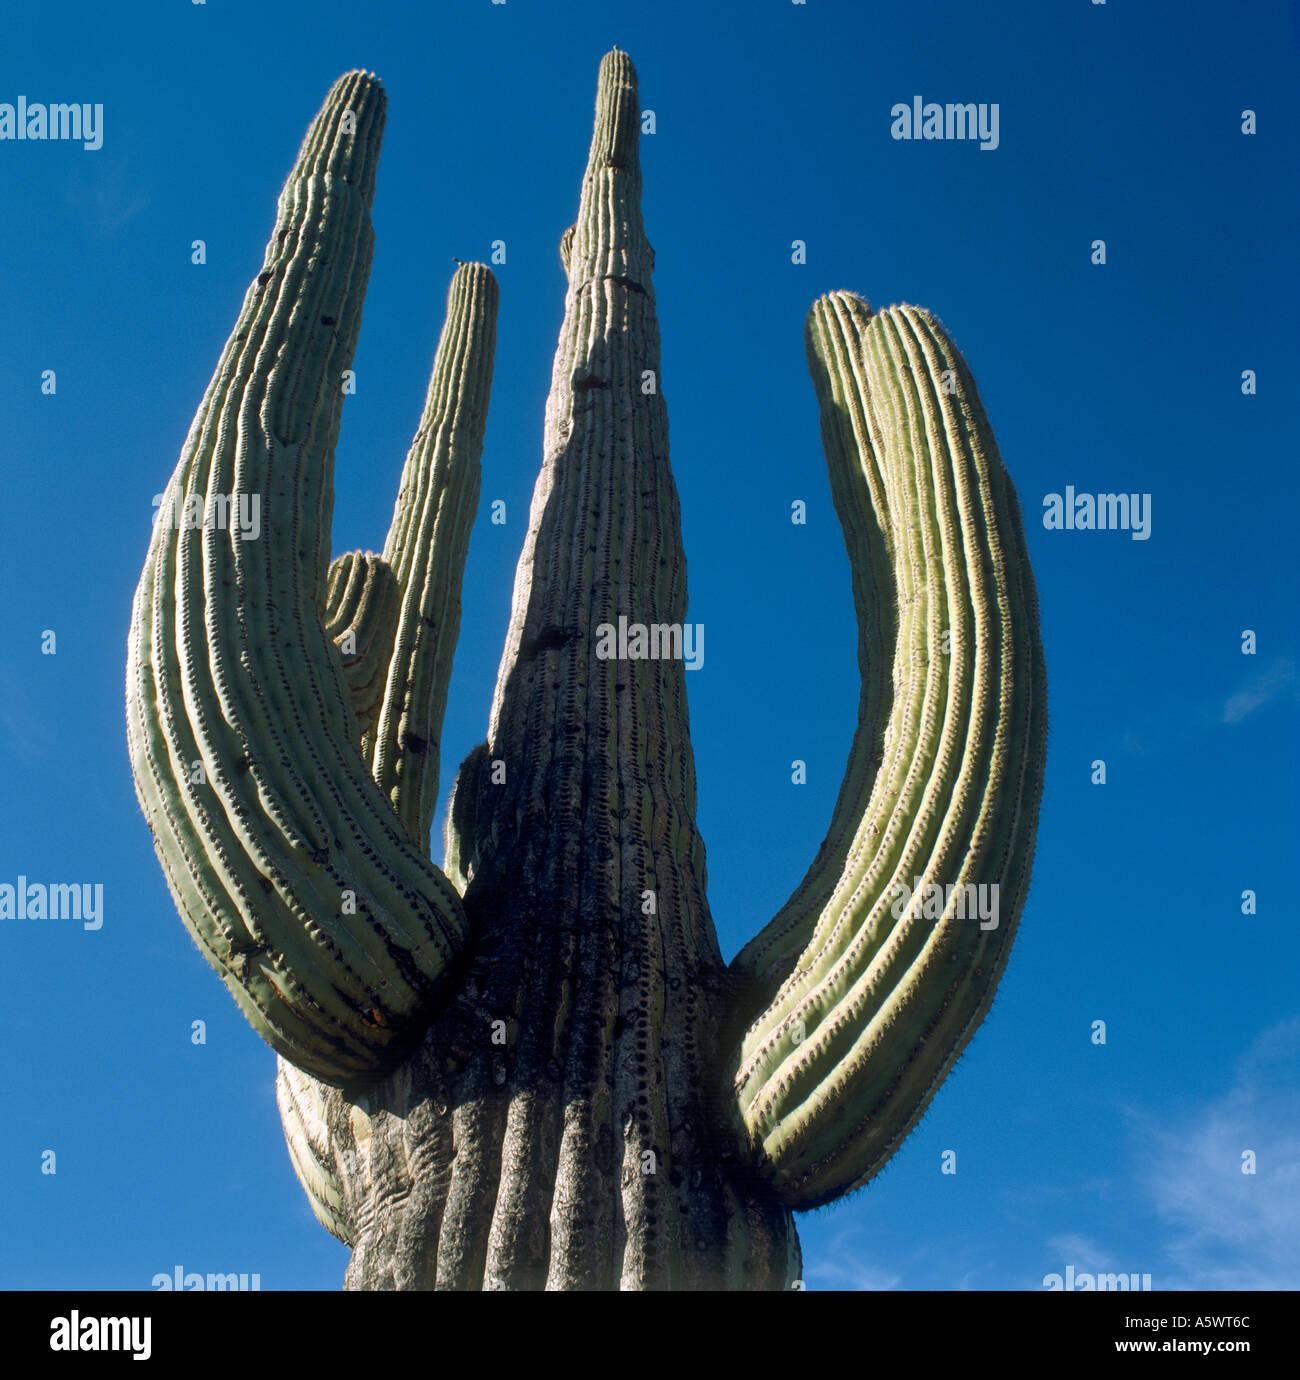 Giant Saguaro Cactus, Arizona, USA - Stock Image